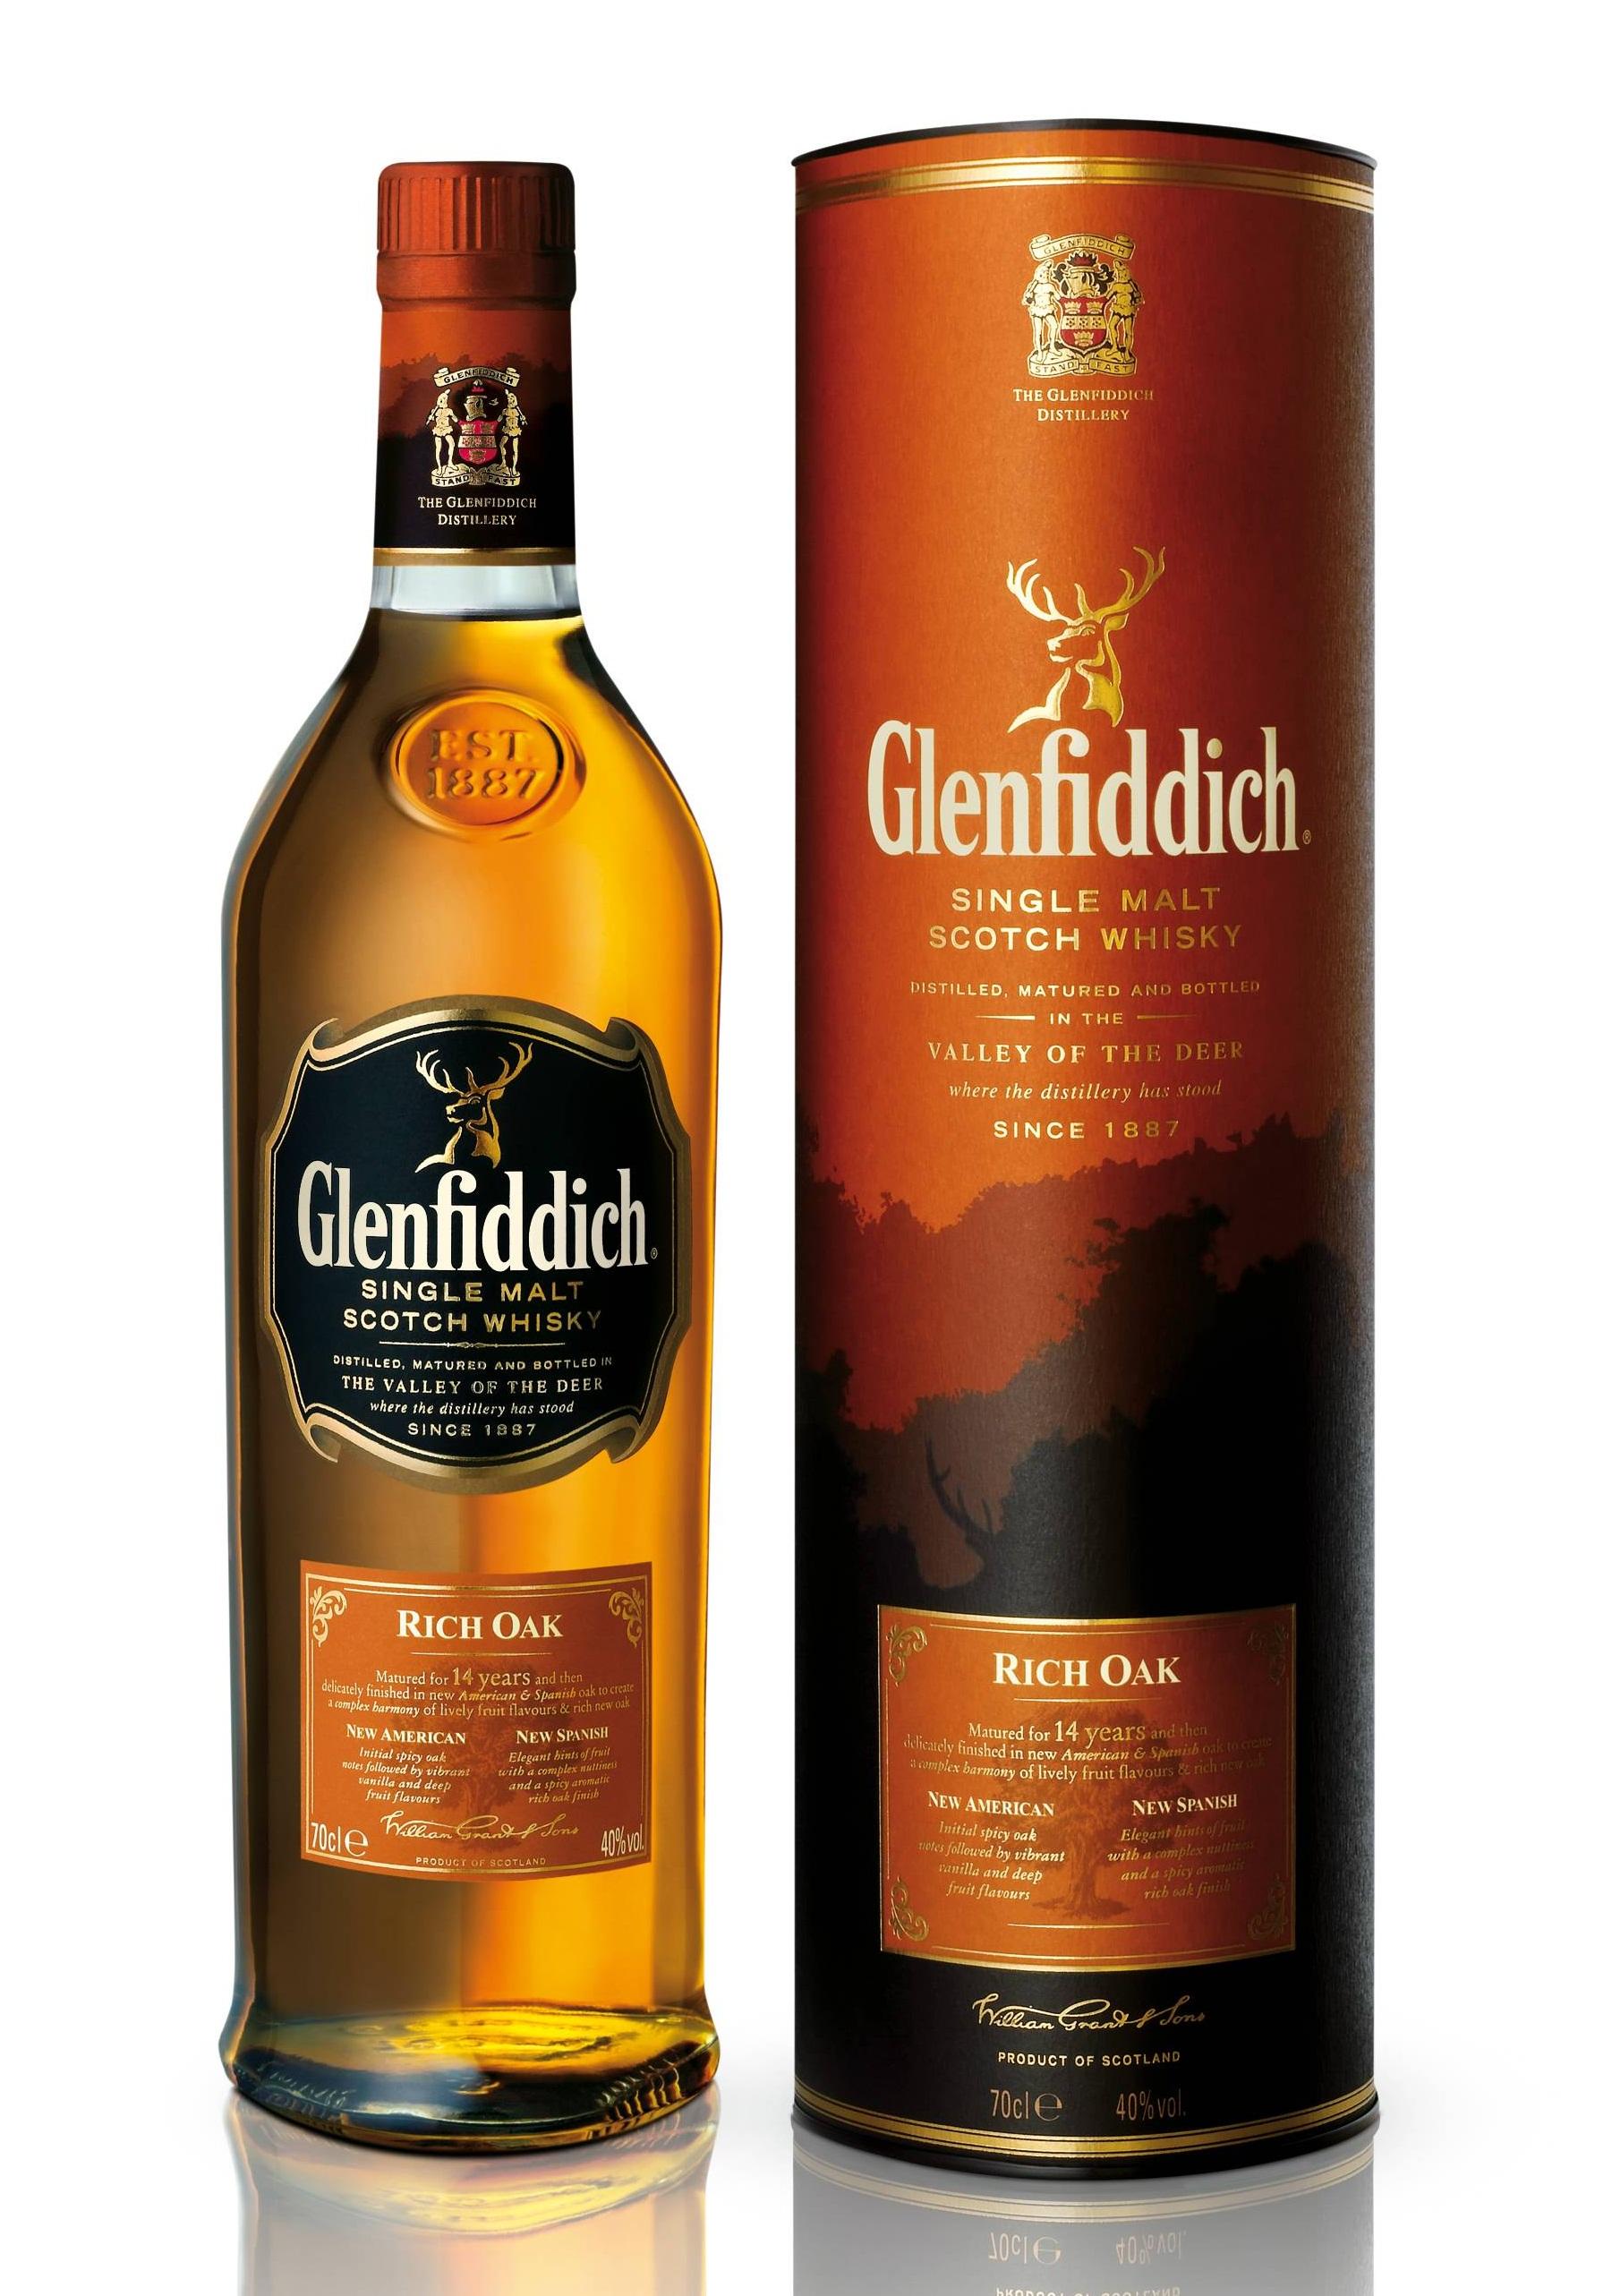 One day you will. Glenfiddich Rich Oak. | Everyday Drinking: http://everydaydrinking.wordpress.com/2011/09/29/one-day-you-will-glenfiddich-rich-oak/